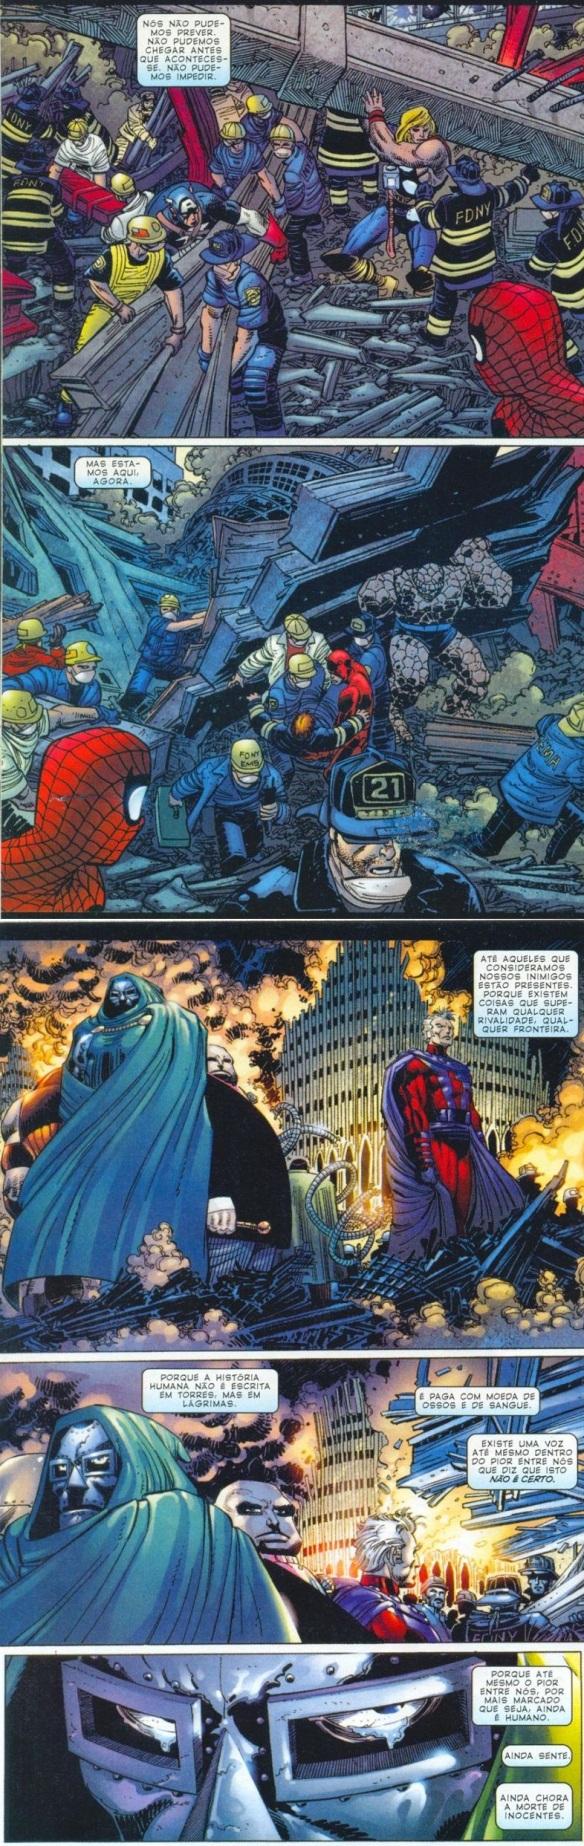 Spiderman - 11 de setembro Heróis e Inimigos